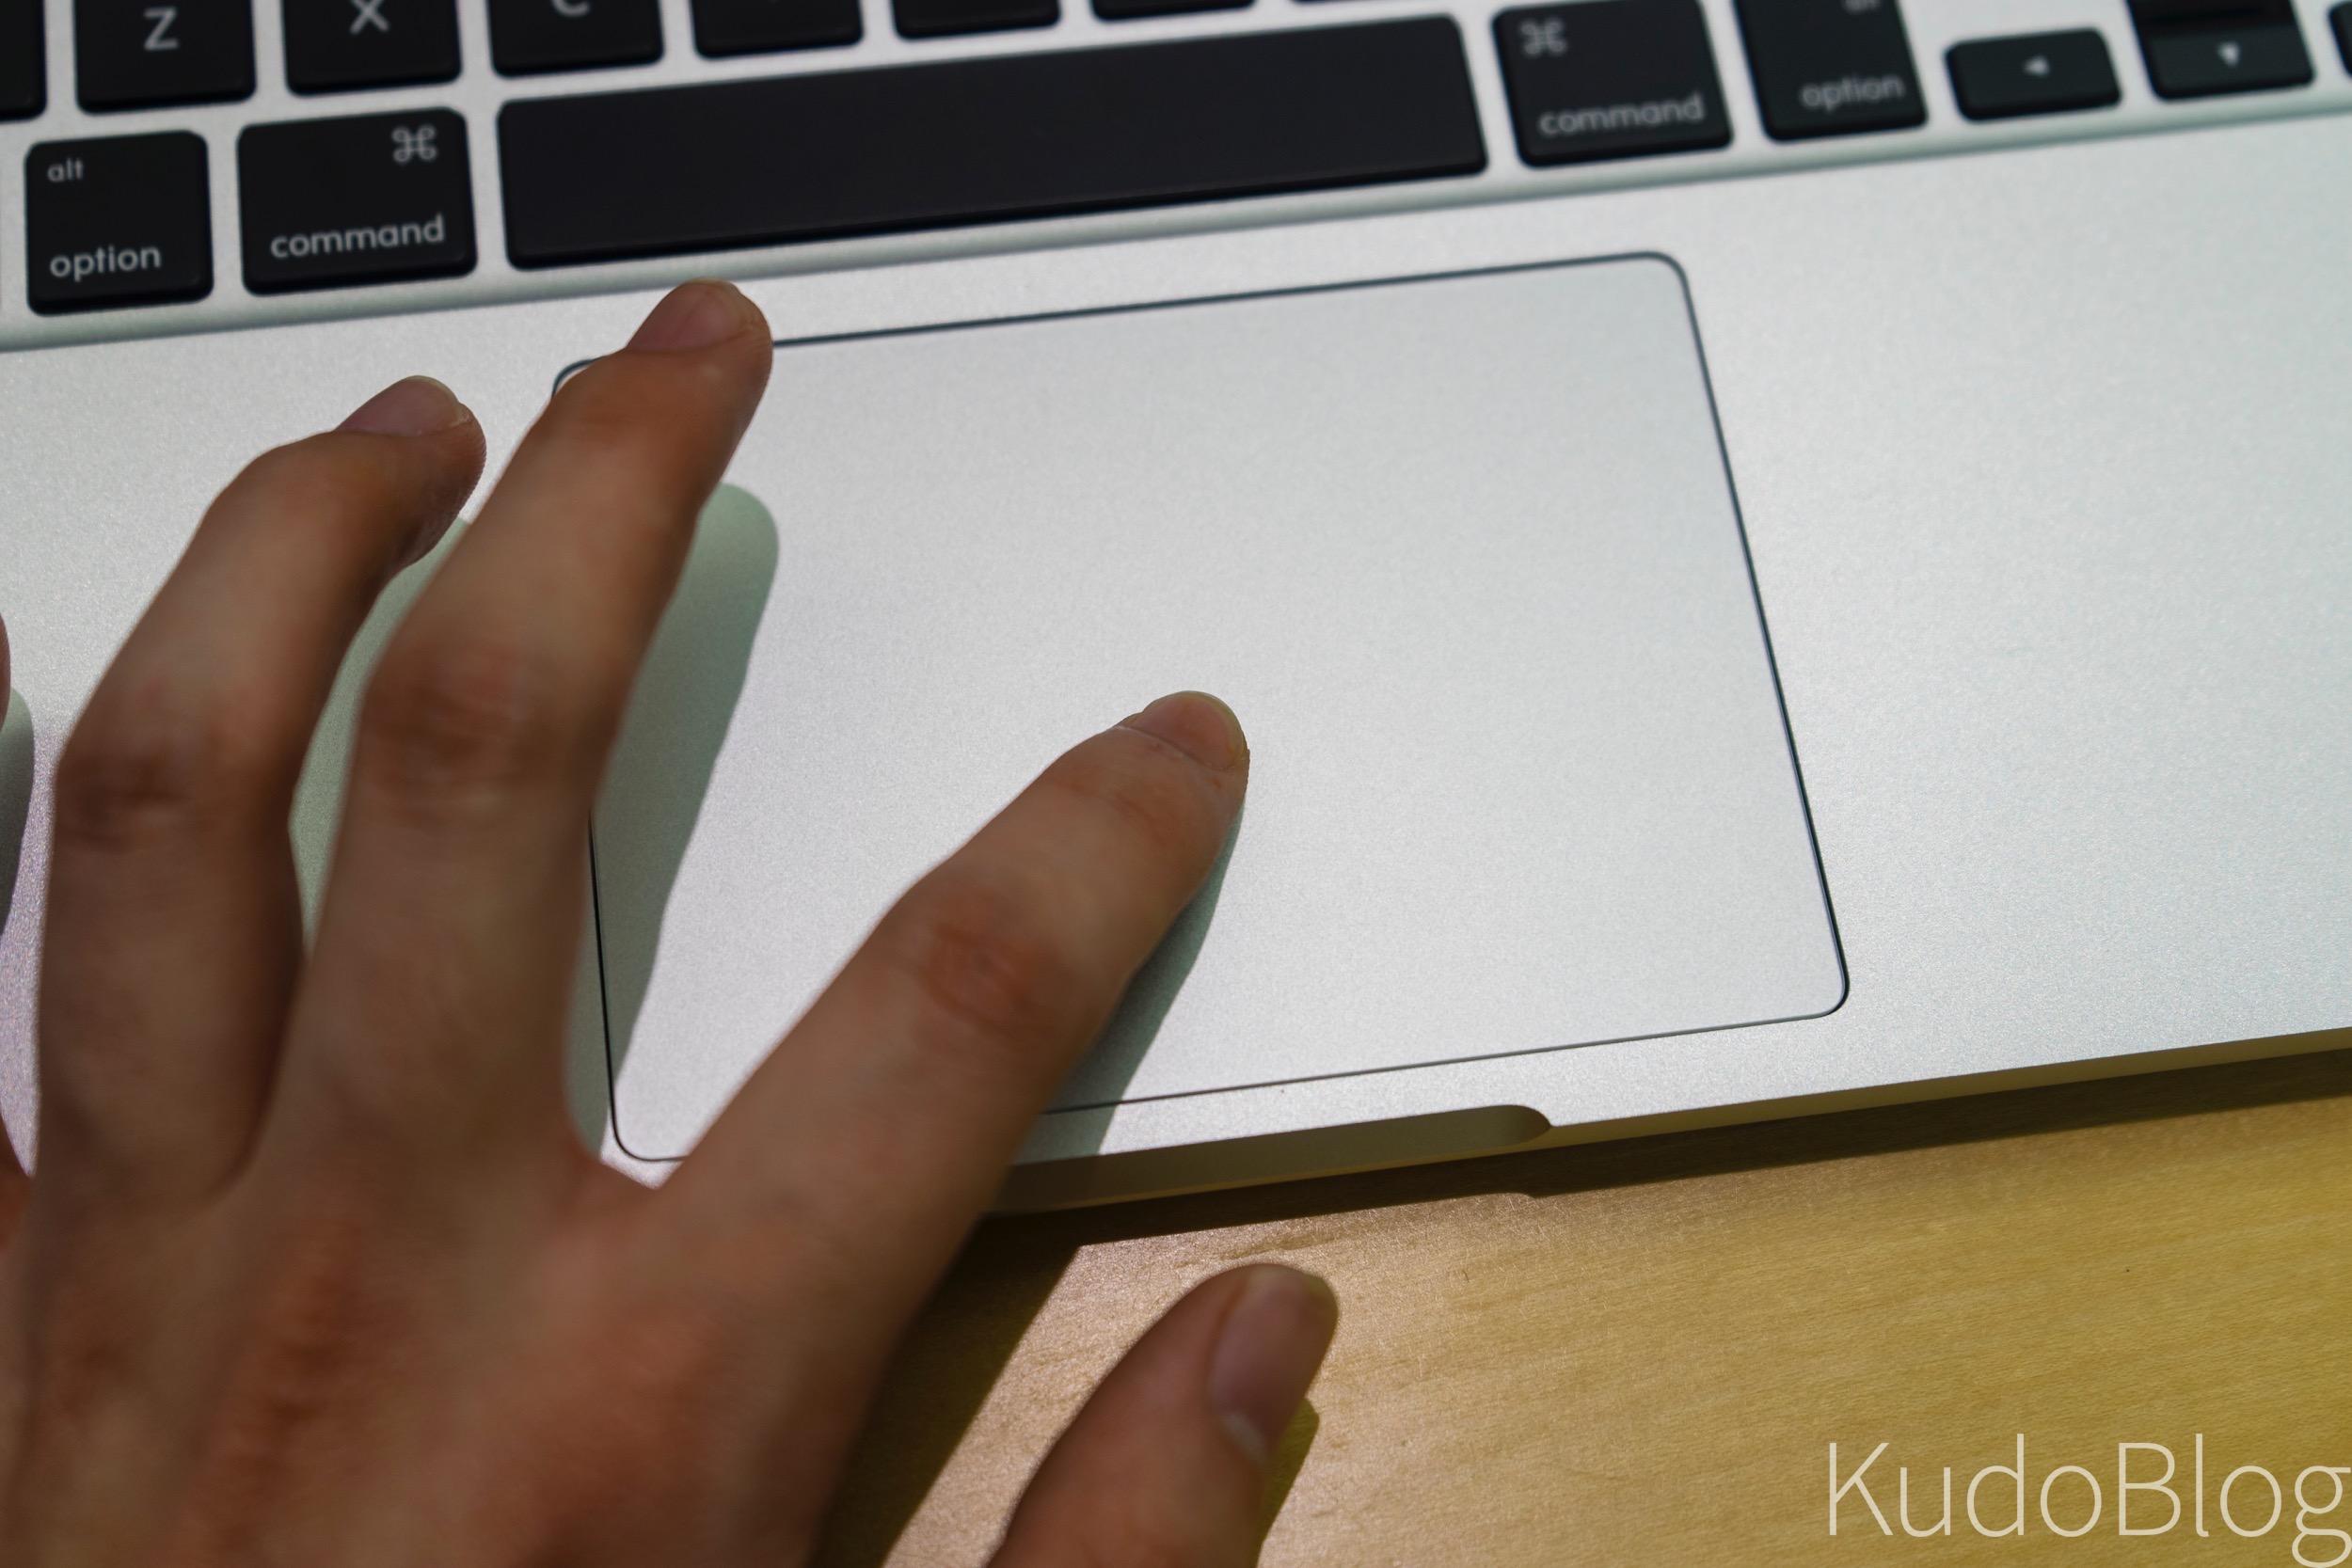 [KudoTouch] 애플 포스 터치 트랙패드